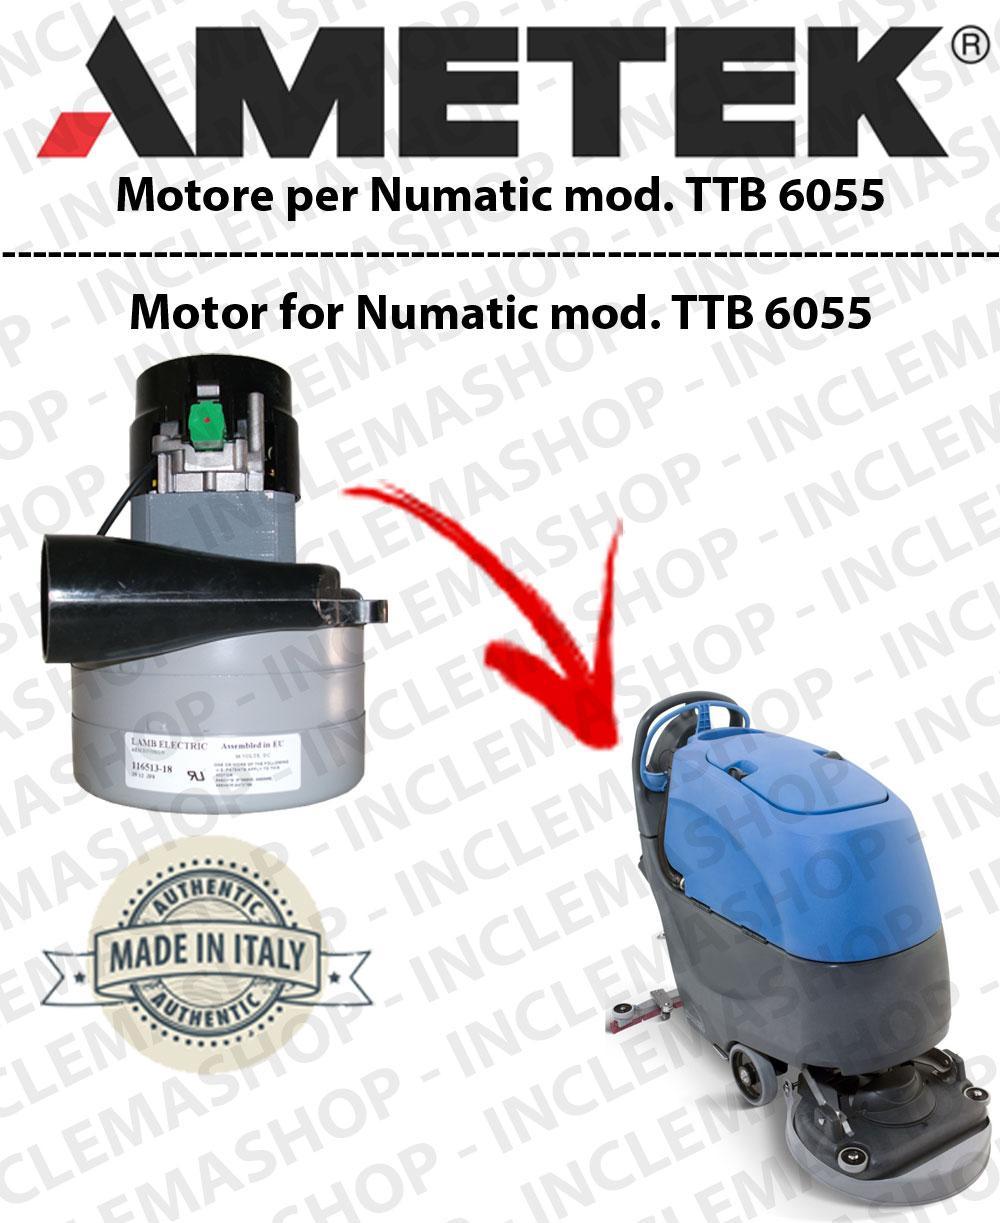 TTB 6055 Saugmotor LAMB AMETEK für Scheuersaugmaschinen NUMATIC